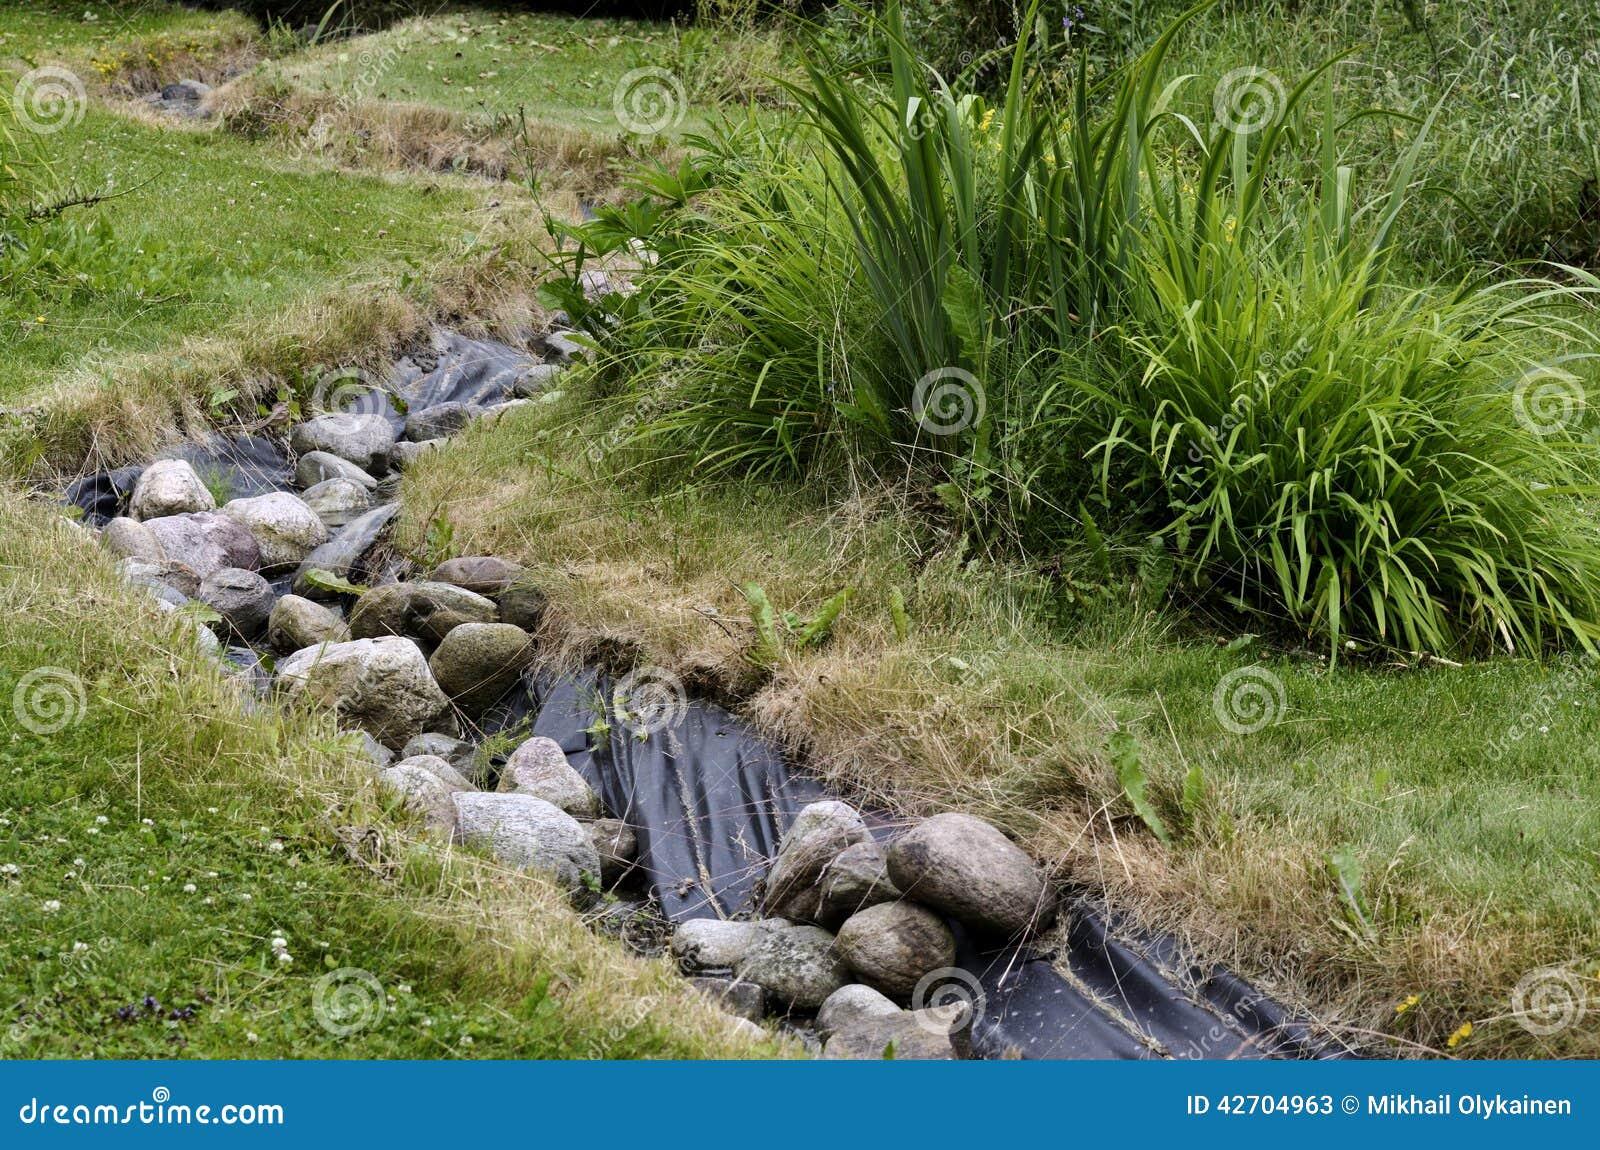 courant artificiel d 39 tang et jardin am nag en parc d coratif photo stock image 42704963. Black Bedroom Furniture Sets. Home Design Ideas